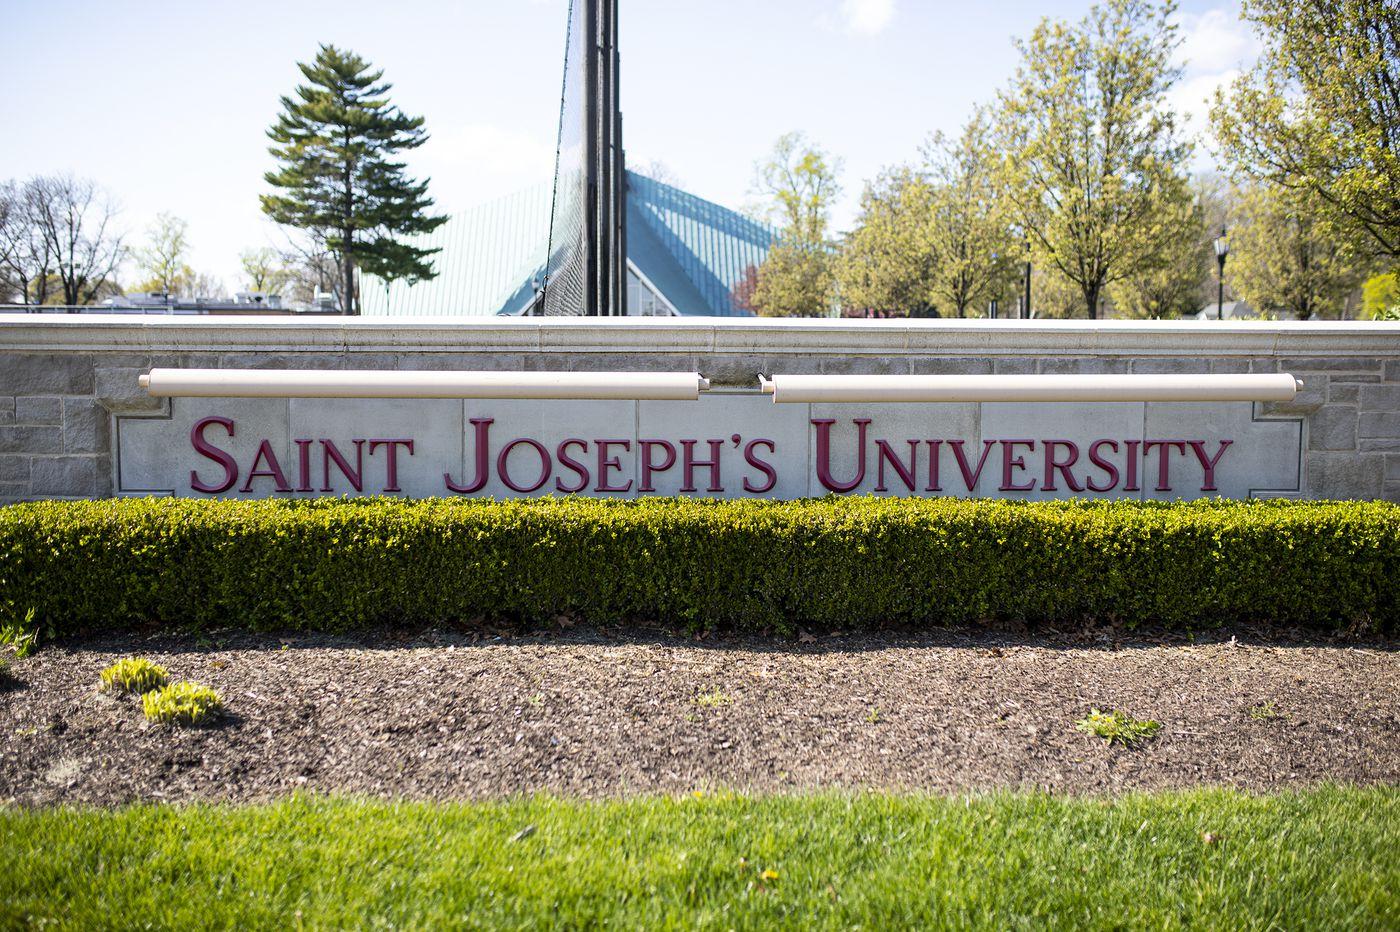 St. Joseph's University asks a sorority to quarantine after potential coronavirus exposure